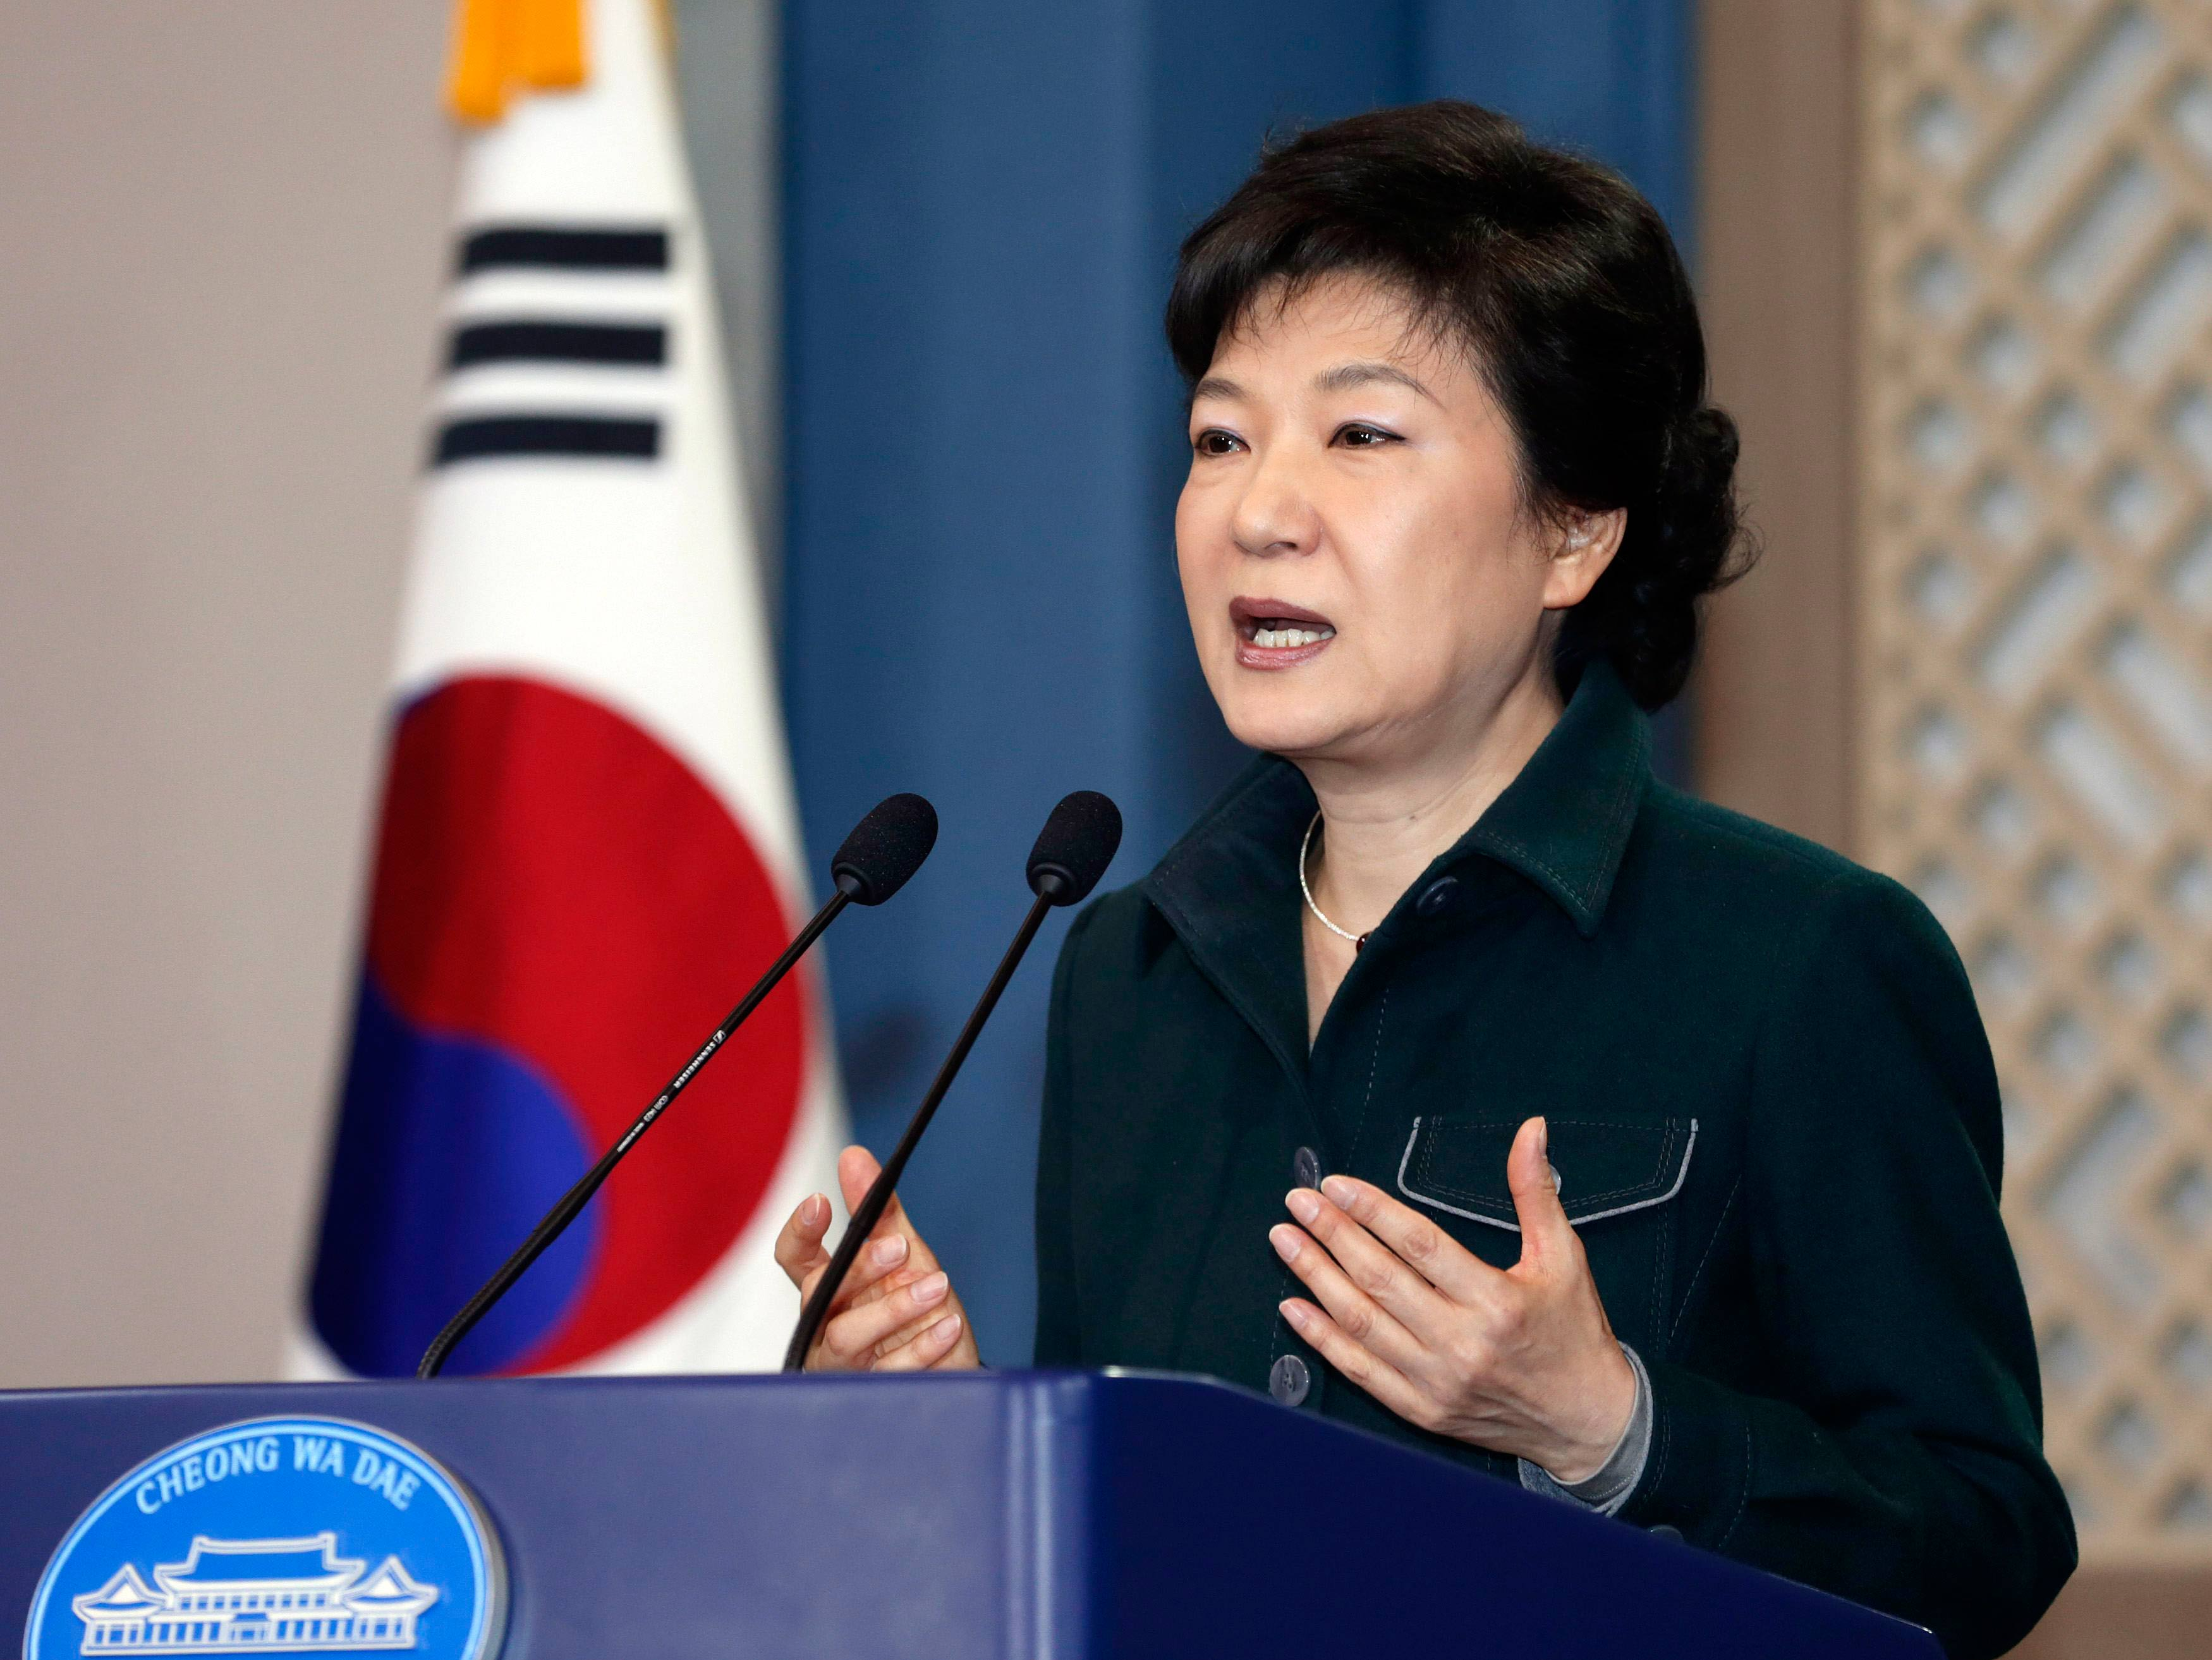 Coreia do Sul: Ministério Público quer ouvir Park Geun-hye